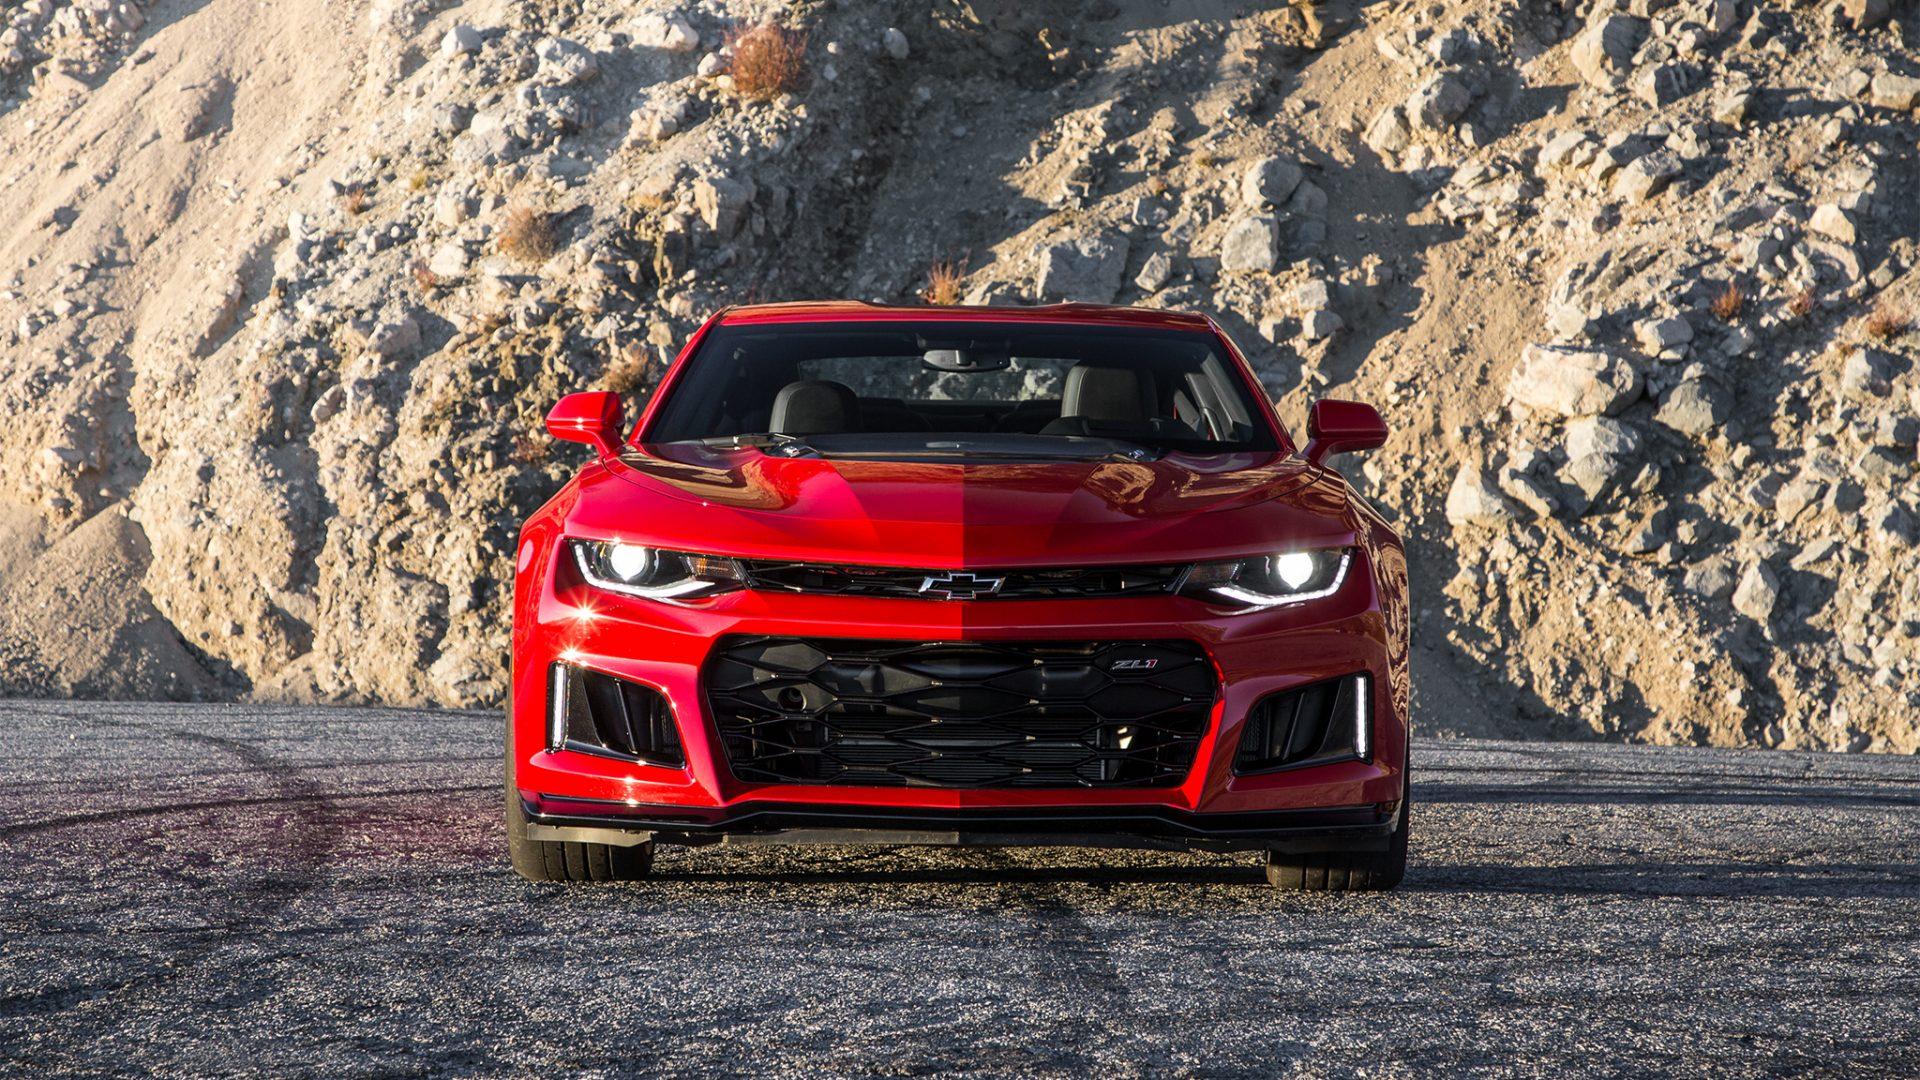 8k Car Wallpaper Download 2017 Chevrolet Camaro Zl1 Red Wallpaper Hd Wallpaper